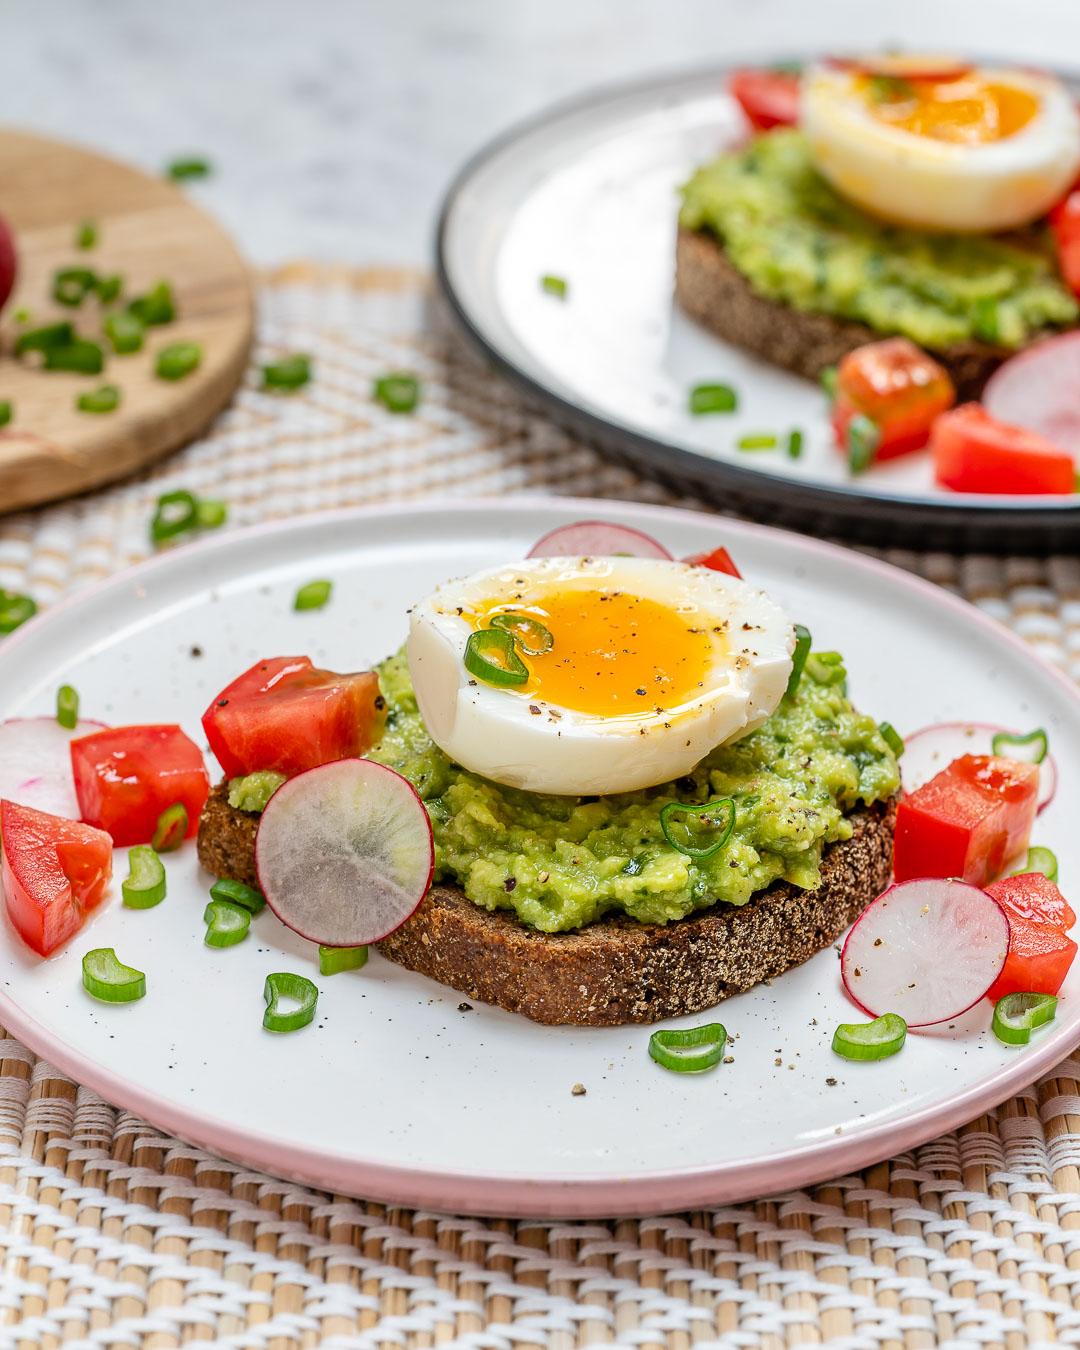 Soft Boiled Egg Avocado Toast Healthy Breakfast